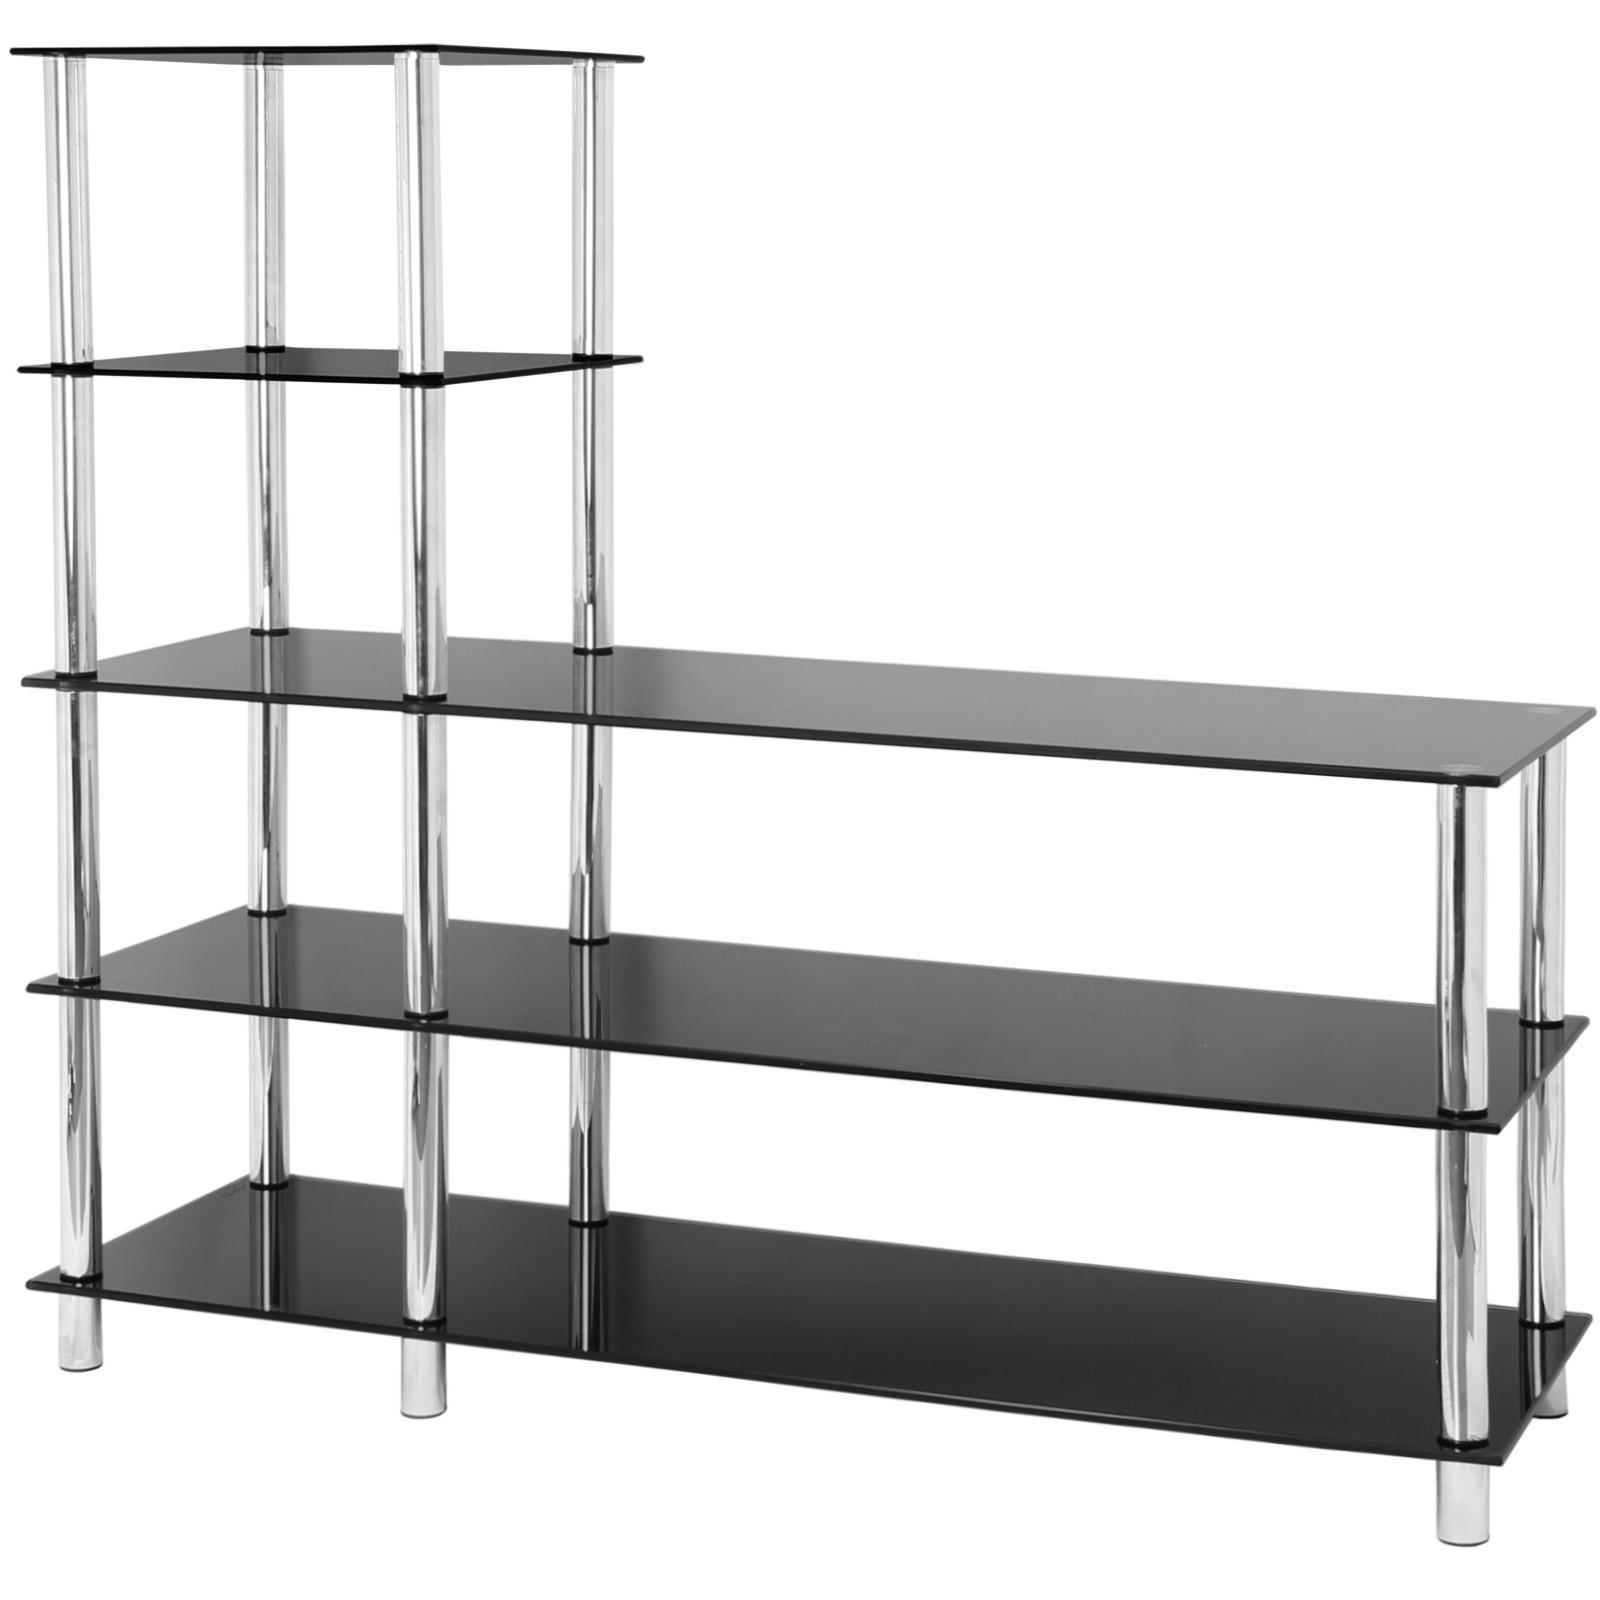 Sentinel Hartleys 5 Tier Black Gl Shelf Tv Unit Console Table Office Bedroom